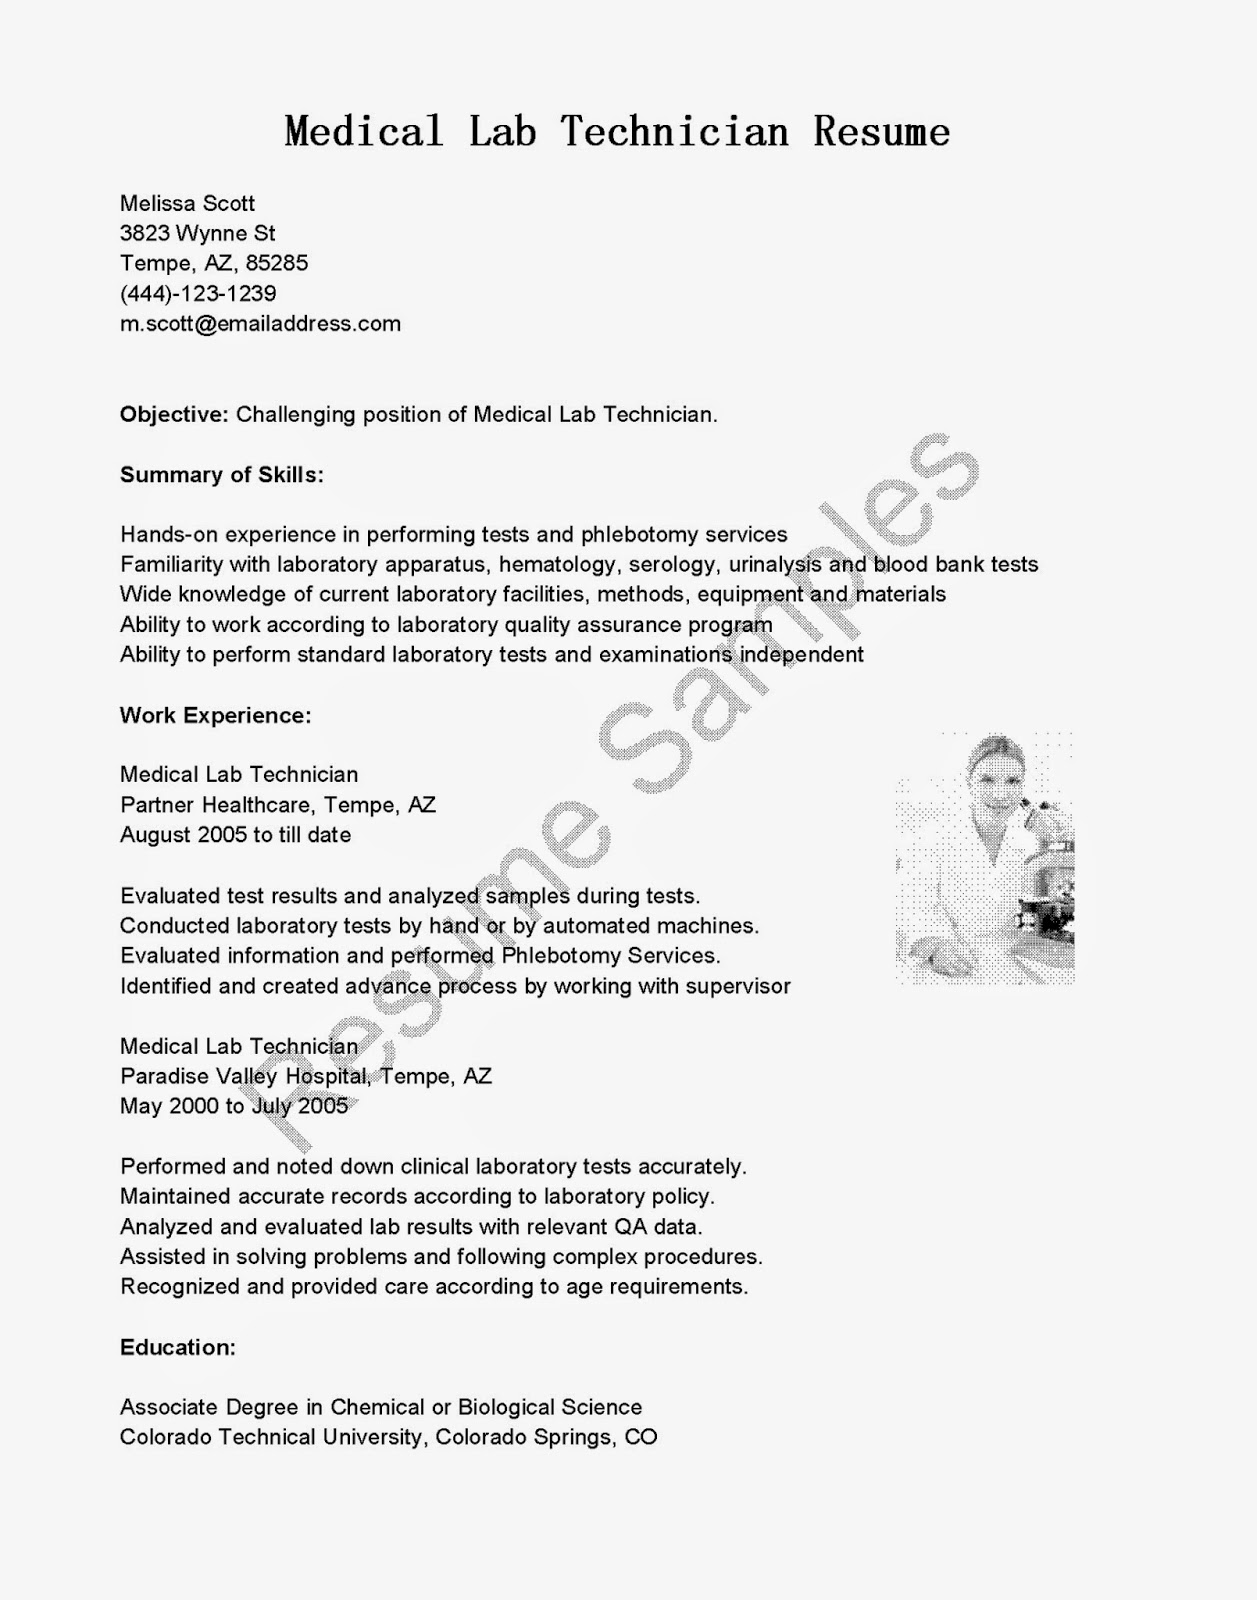 medical laboratory technician resume sample resume samples medical lab technician sample template premium laboratory technician resume sample